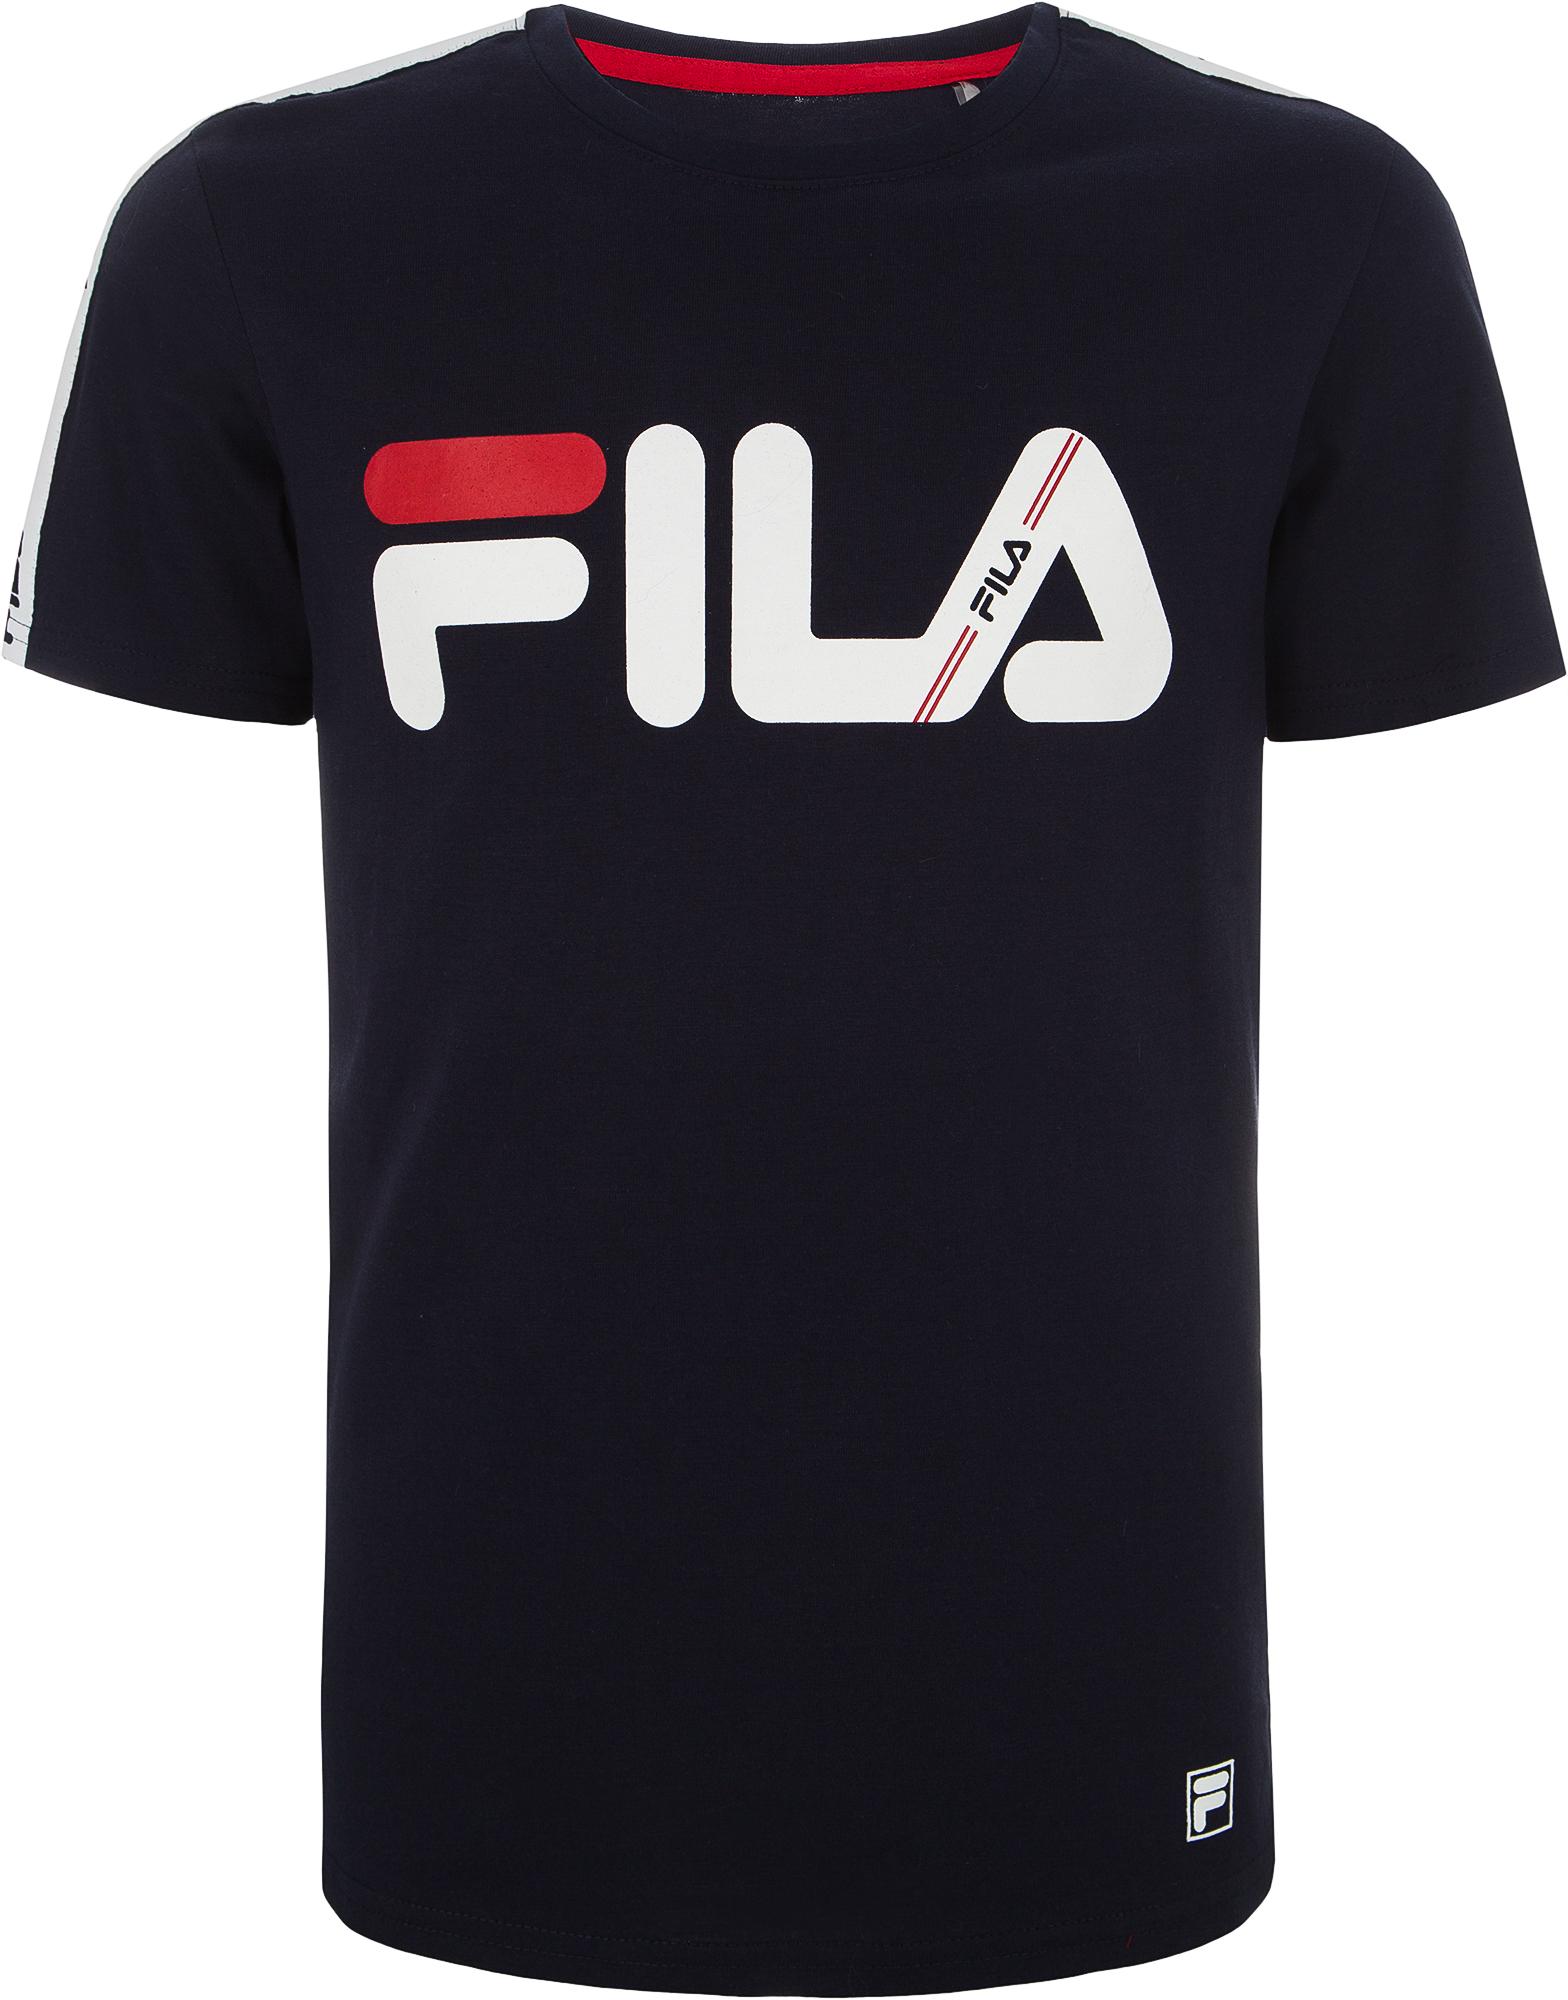 Fila Футболка для мальчиков Fila, размер 134